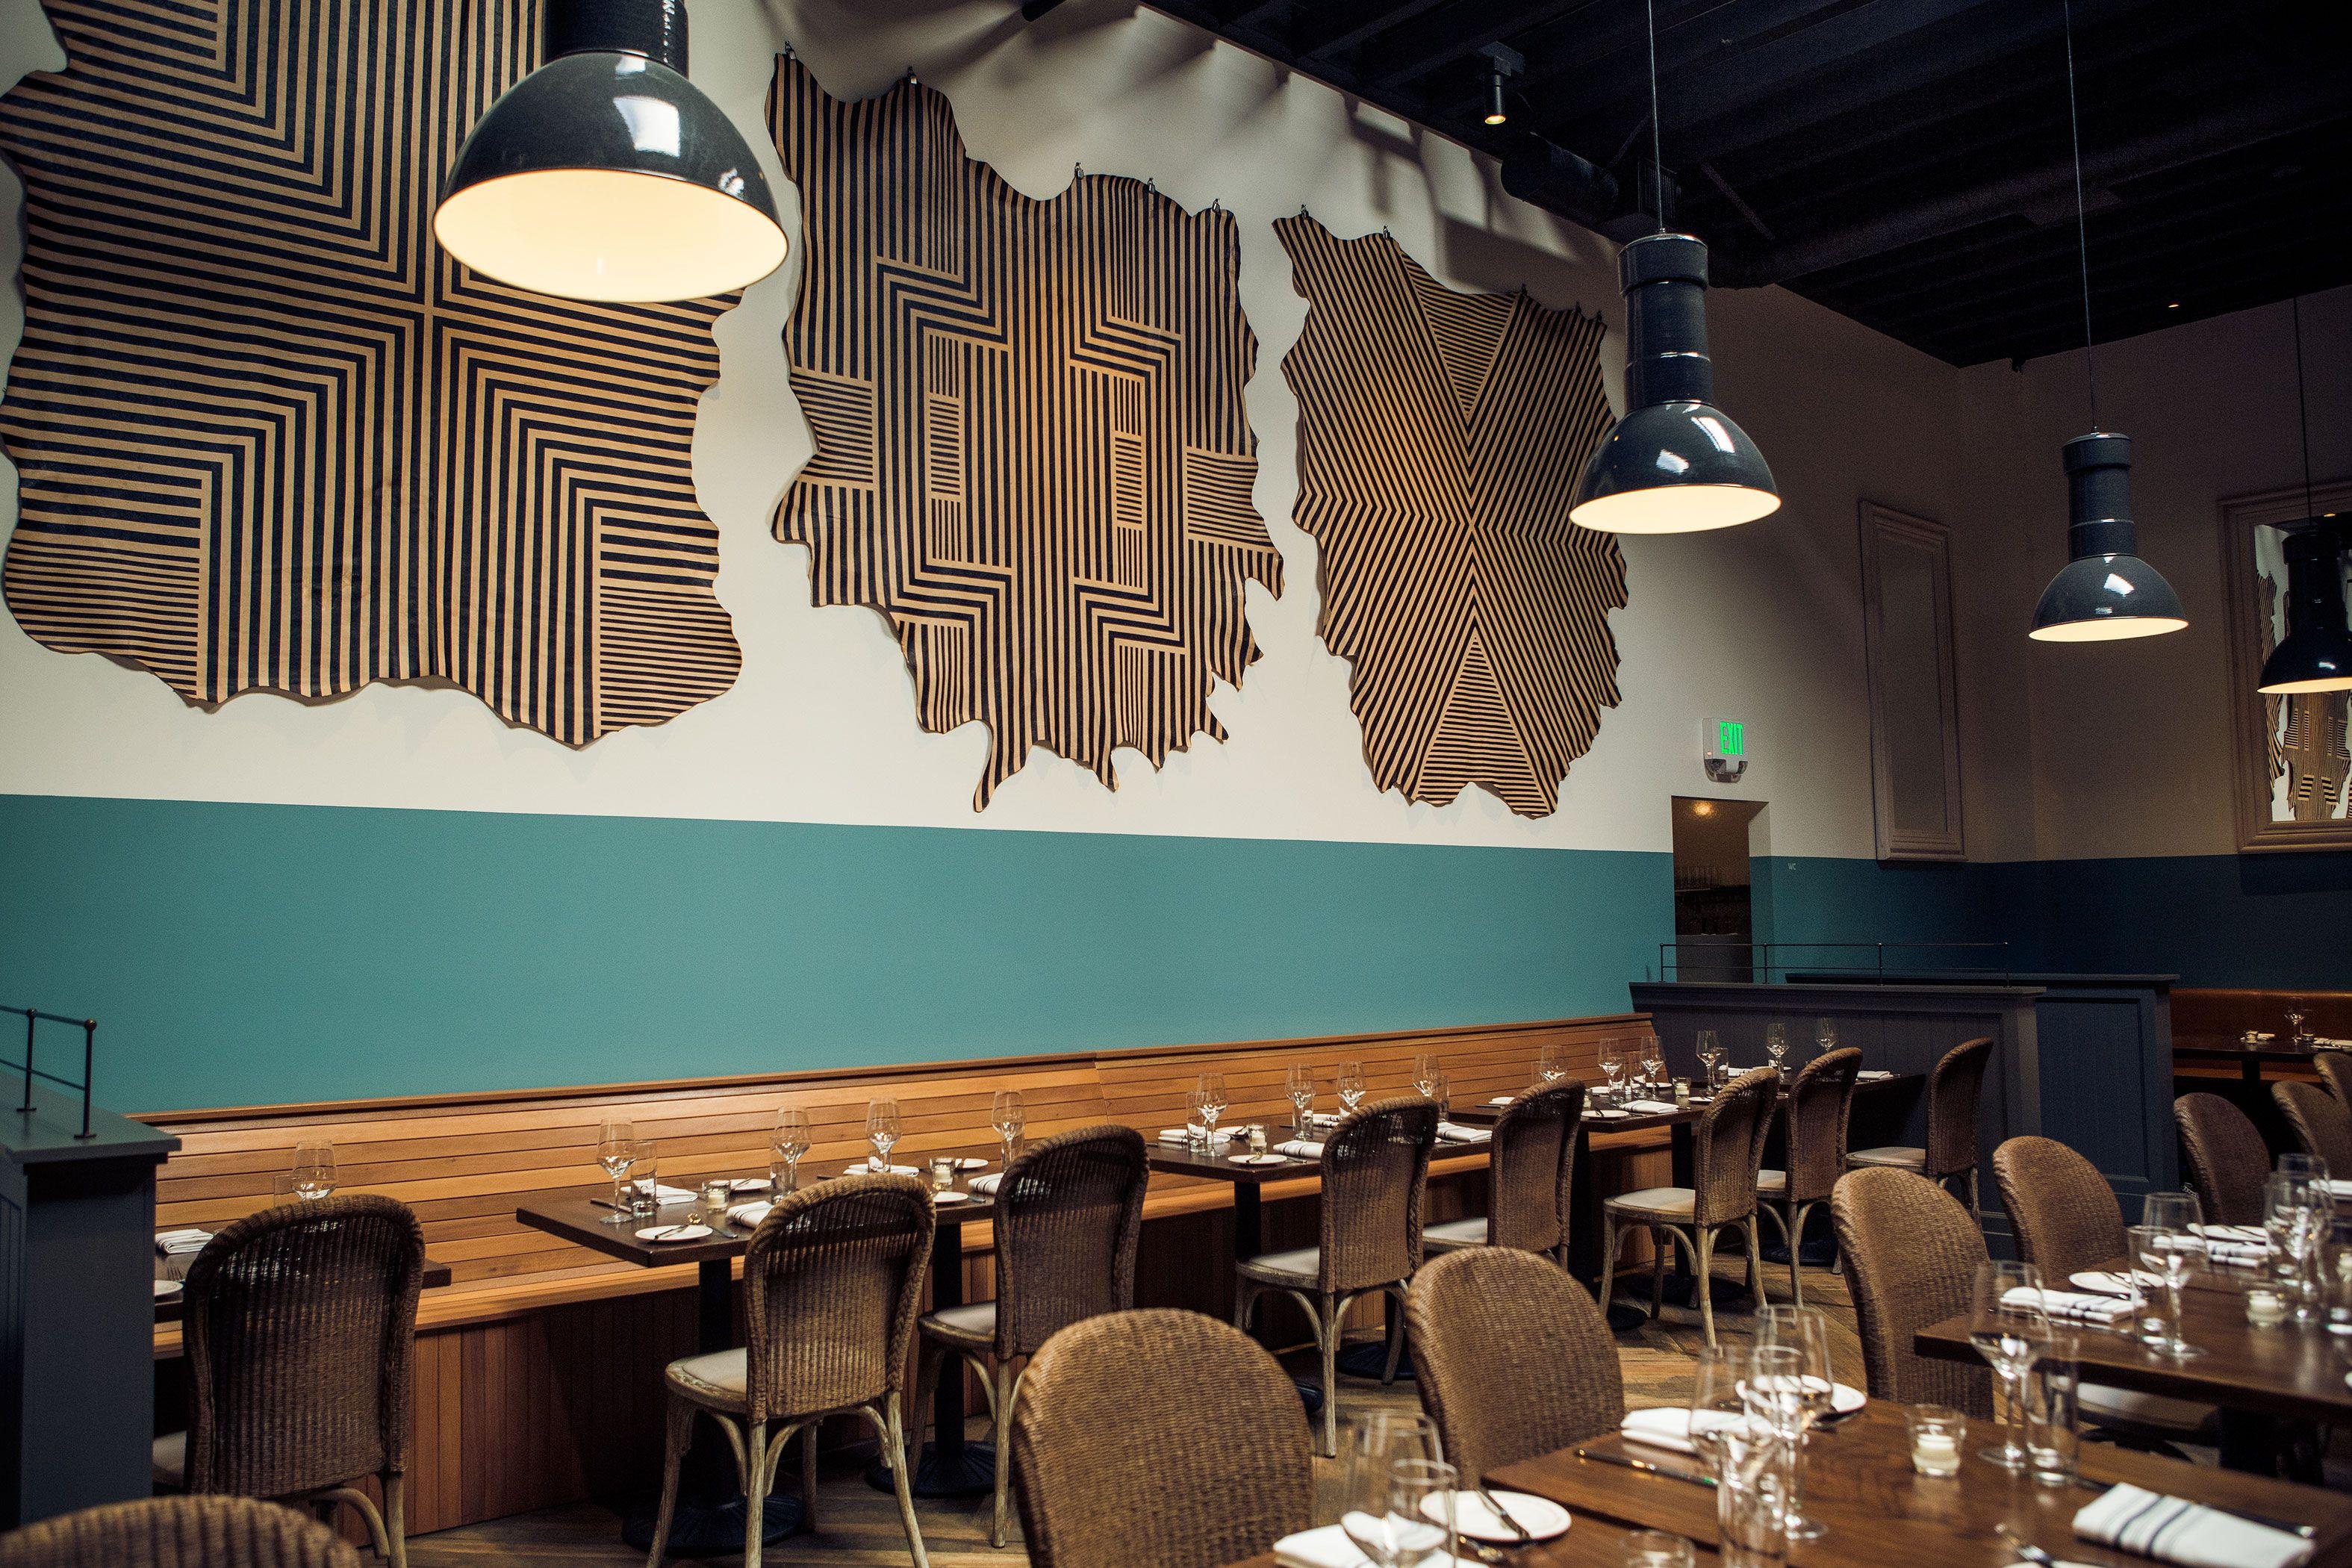 belcampo santa monica features both an 86 seat restaurant serving